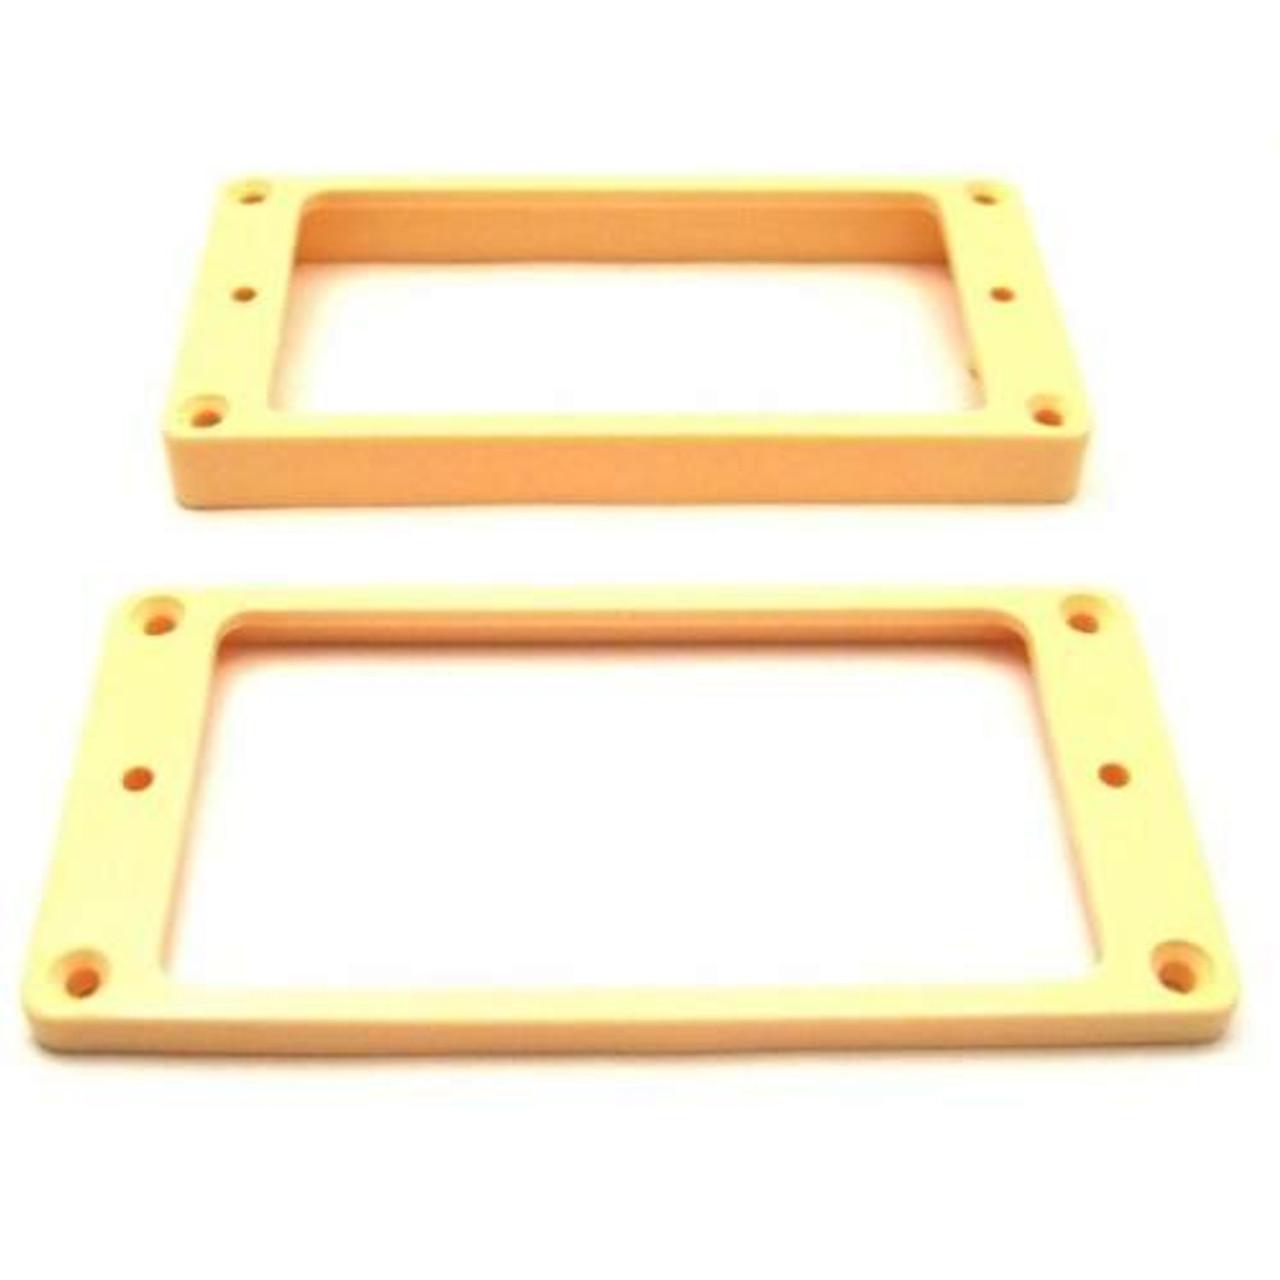 Humbucker Ring Set-Tapered w/ Flat Bottoms-Cream